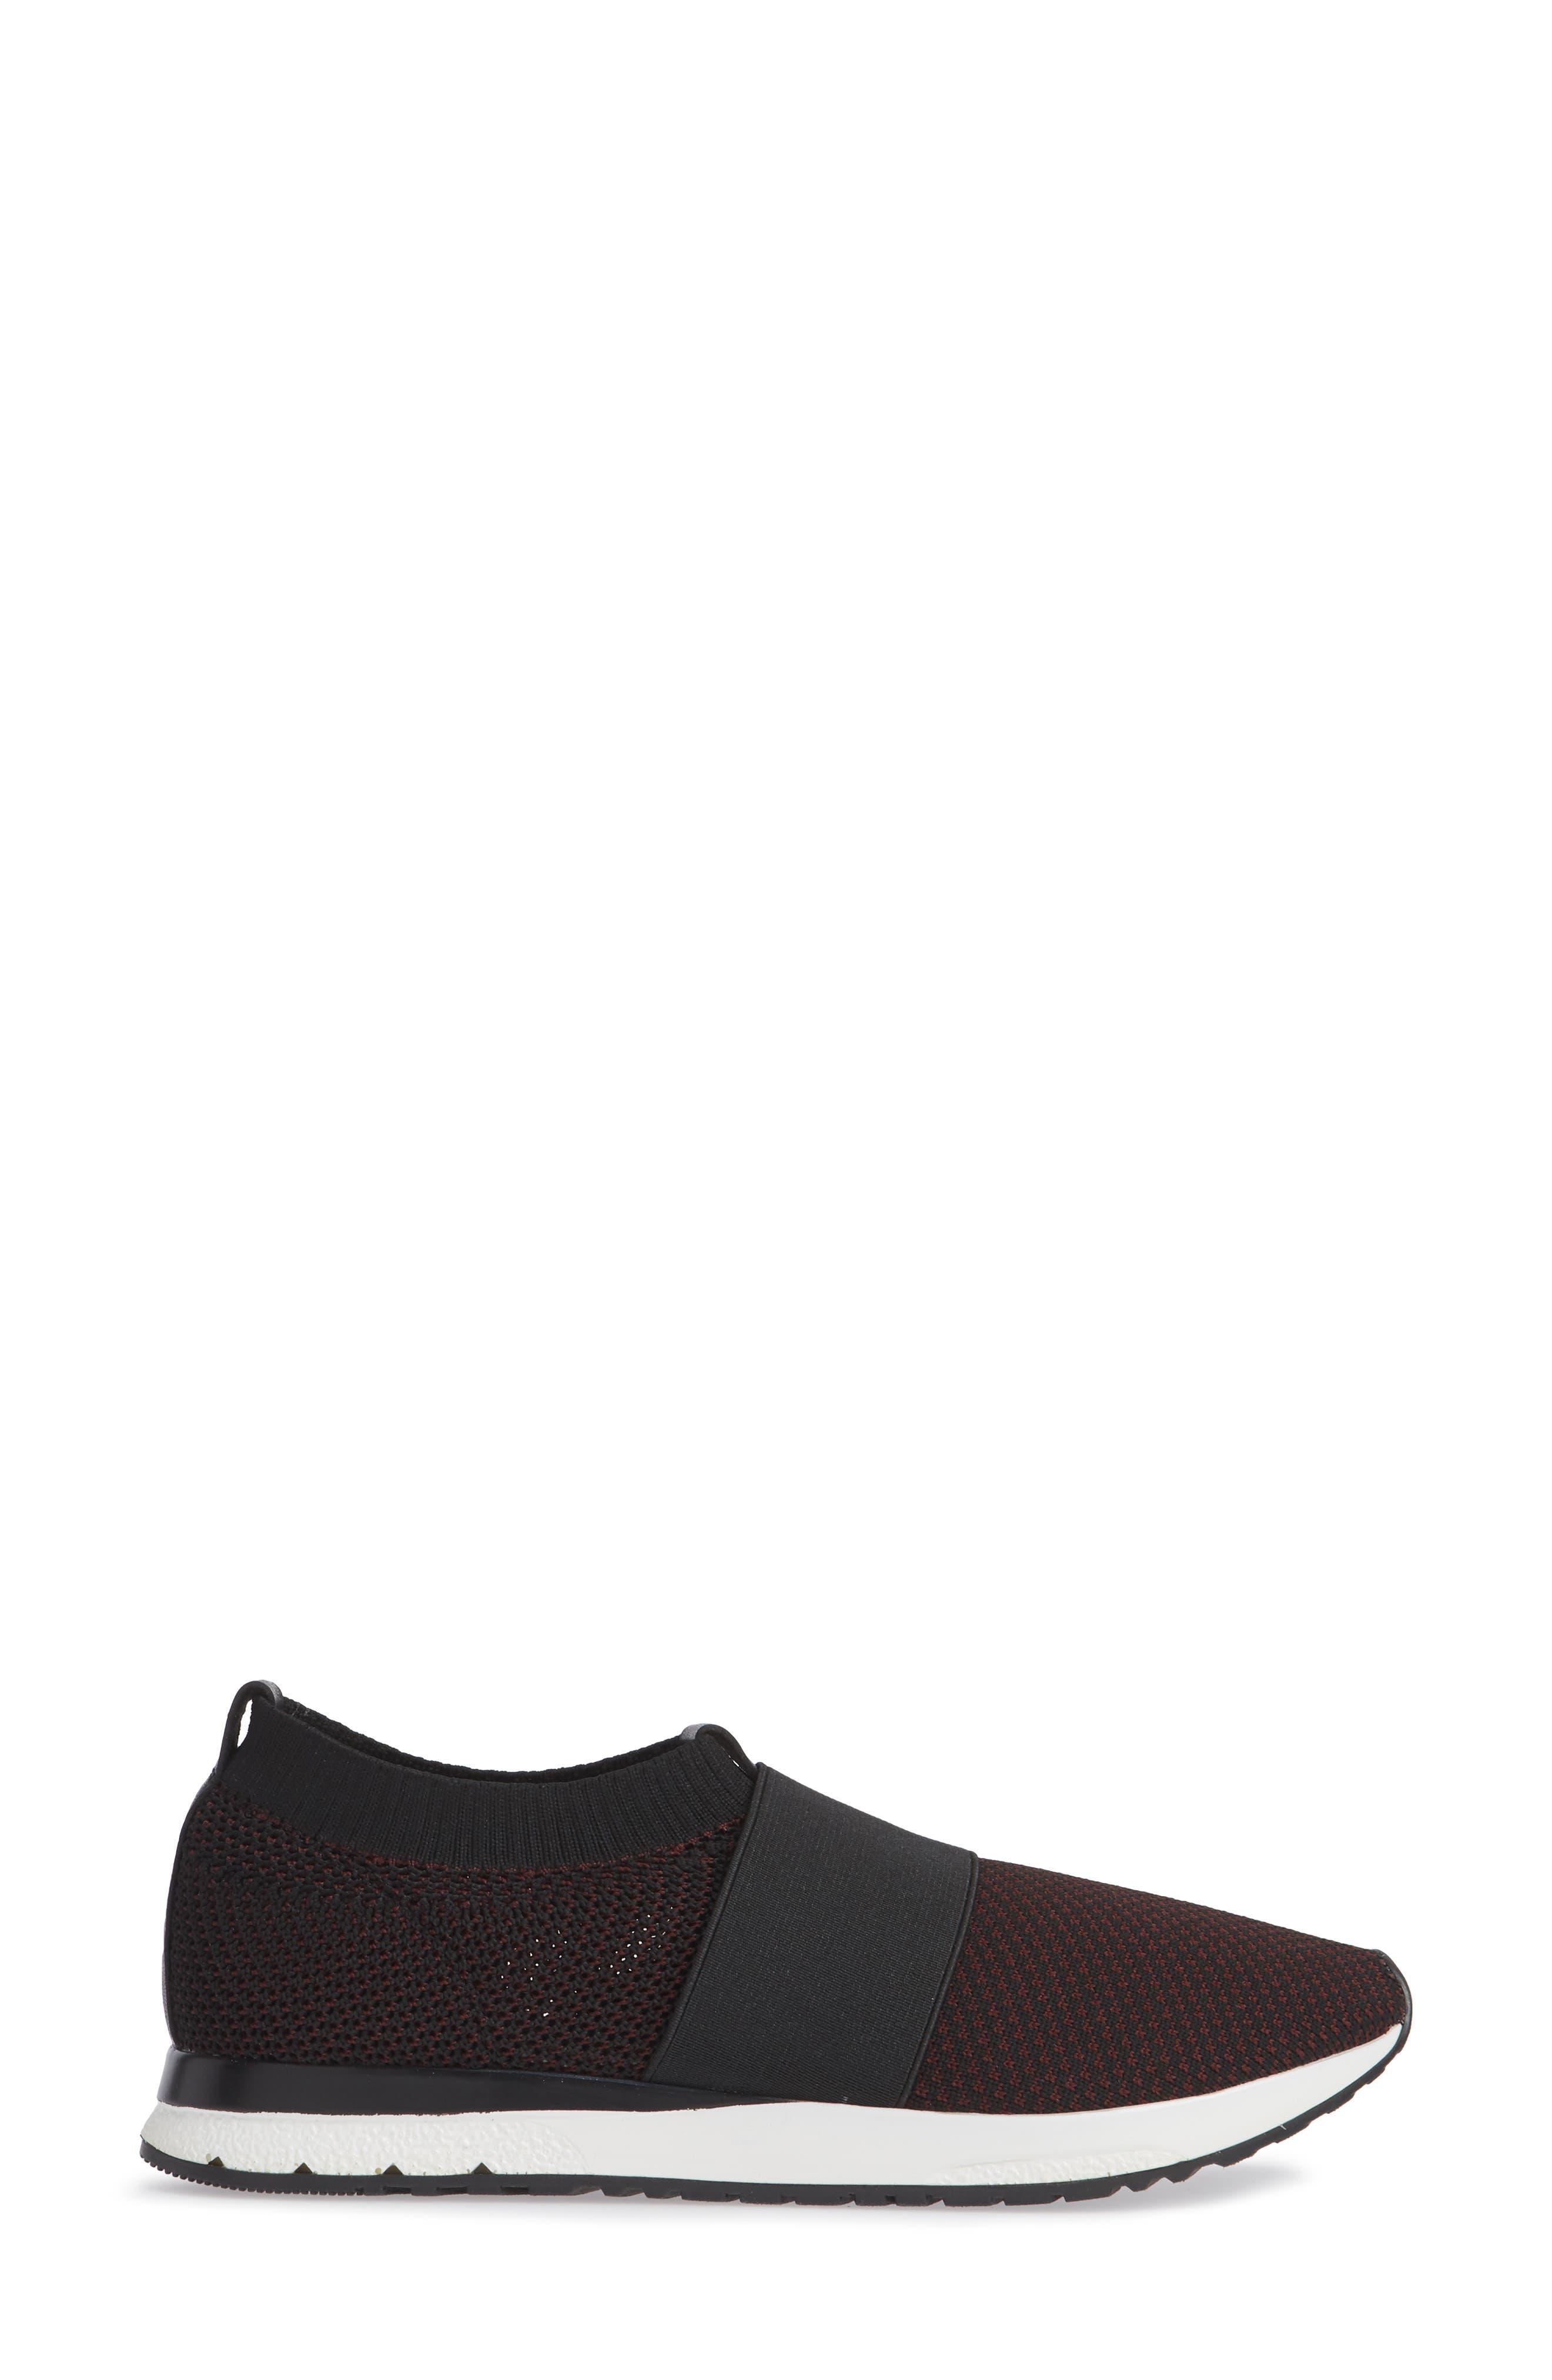 Brooke Slip-On Sneaker,                             Alternate thumbnail 3, color,                             BLACK/ WINE KNIT FABRIC